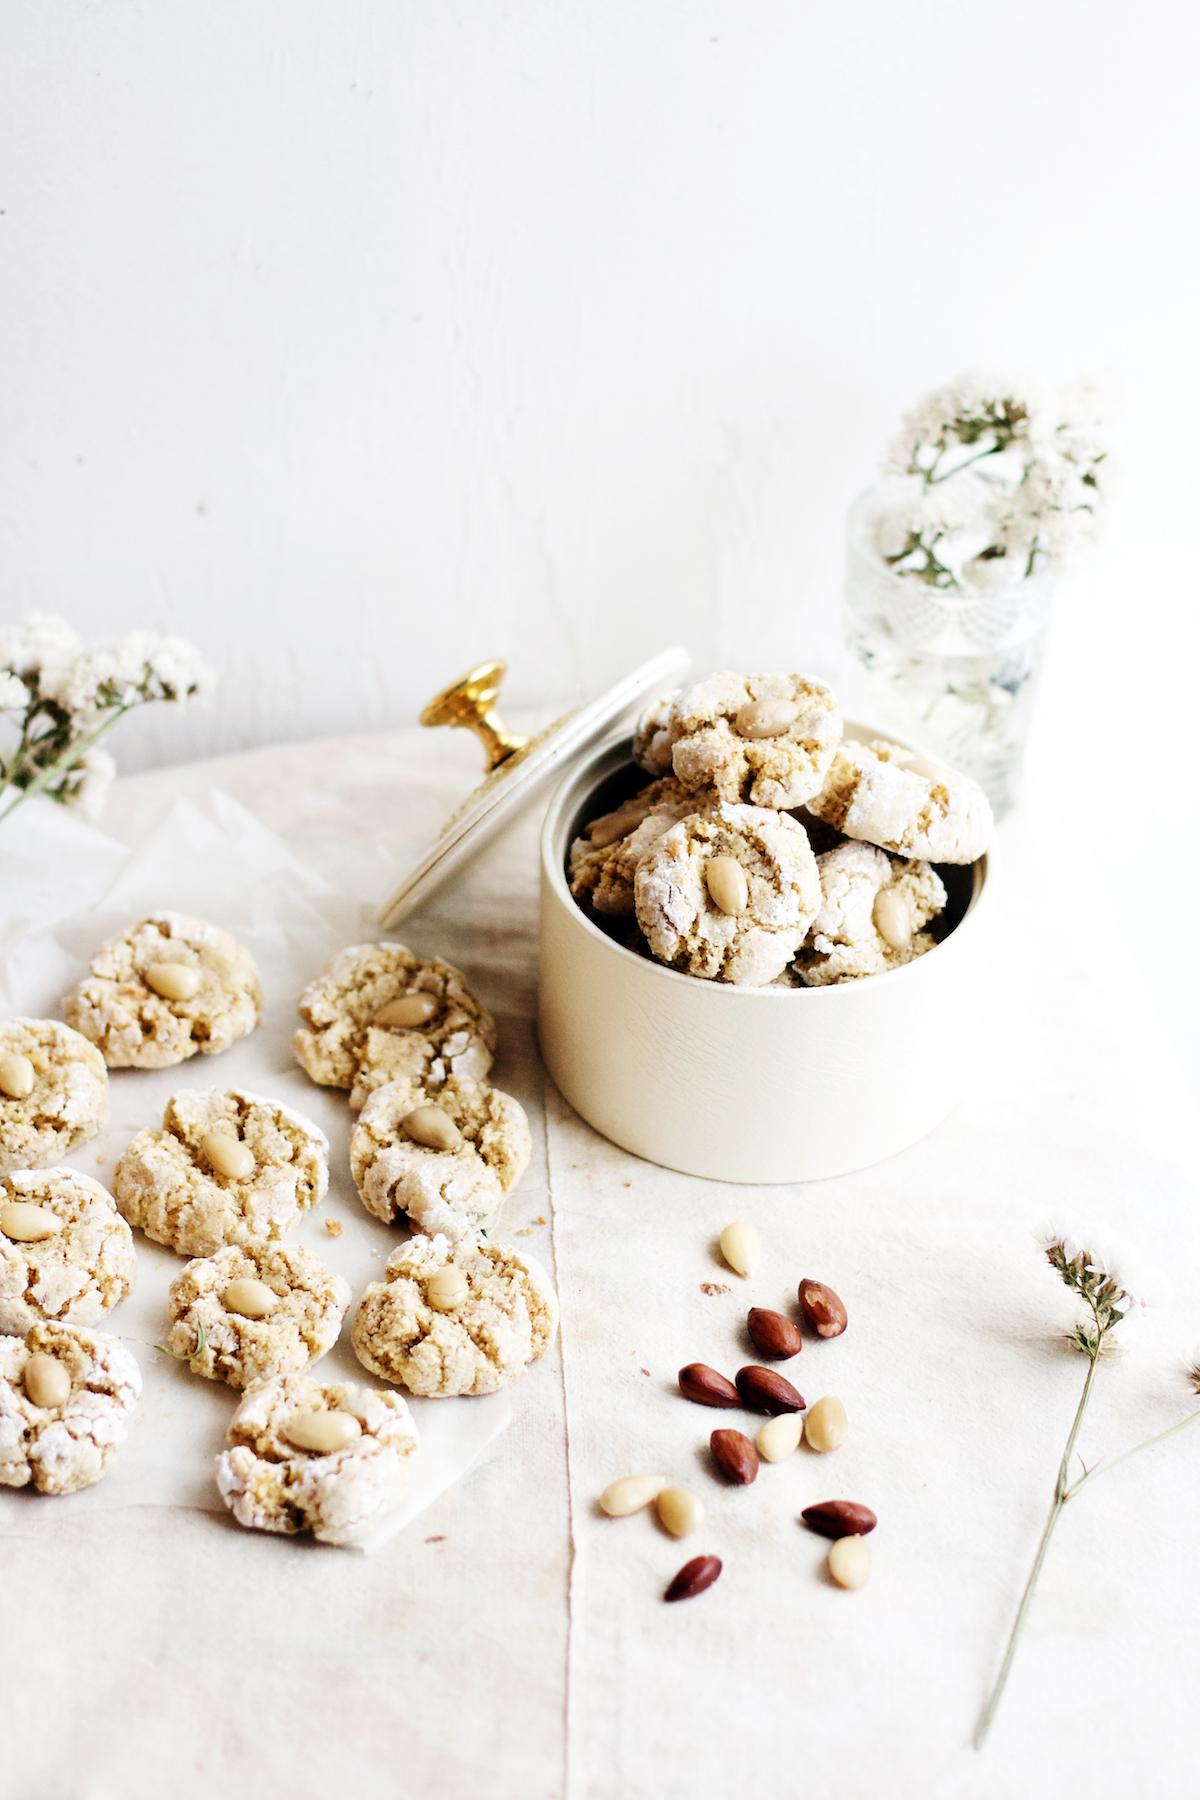 Moroccan Coconut + Almond Cookies, made w/ semolina and orange blossom | Ruby Josephine